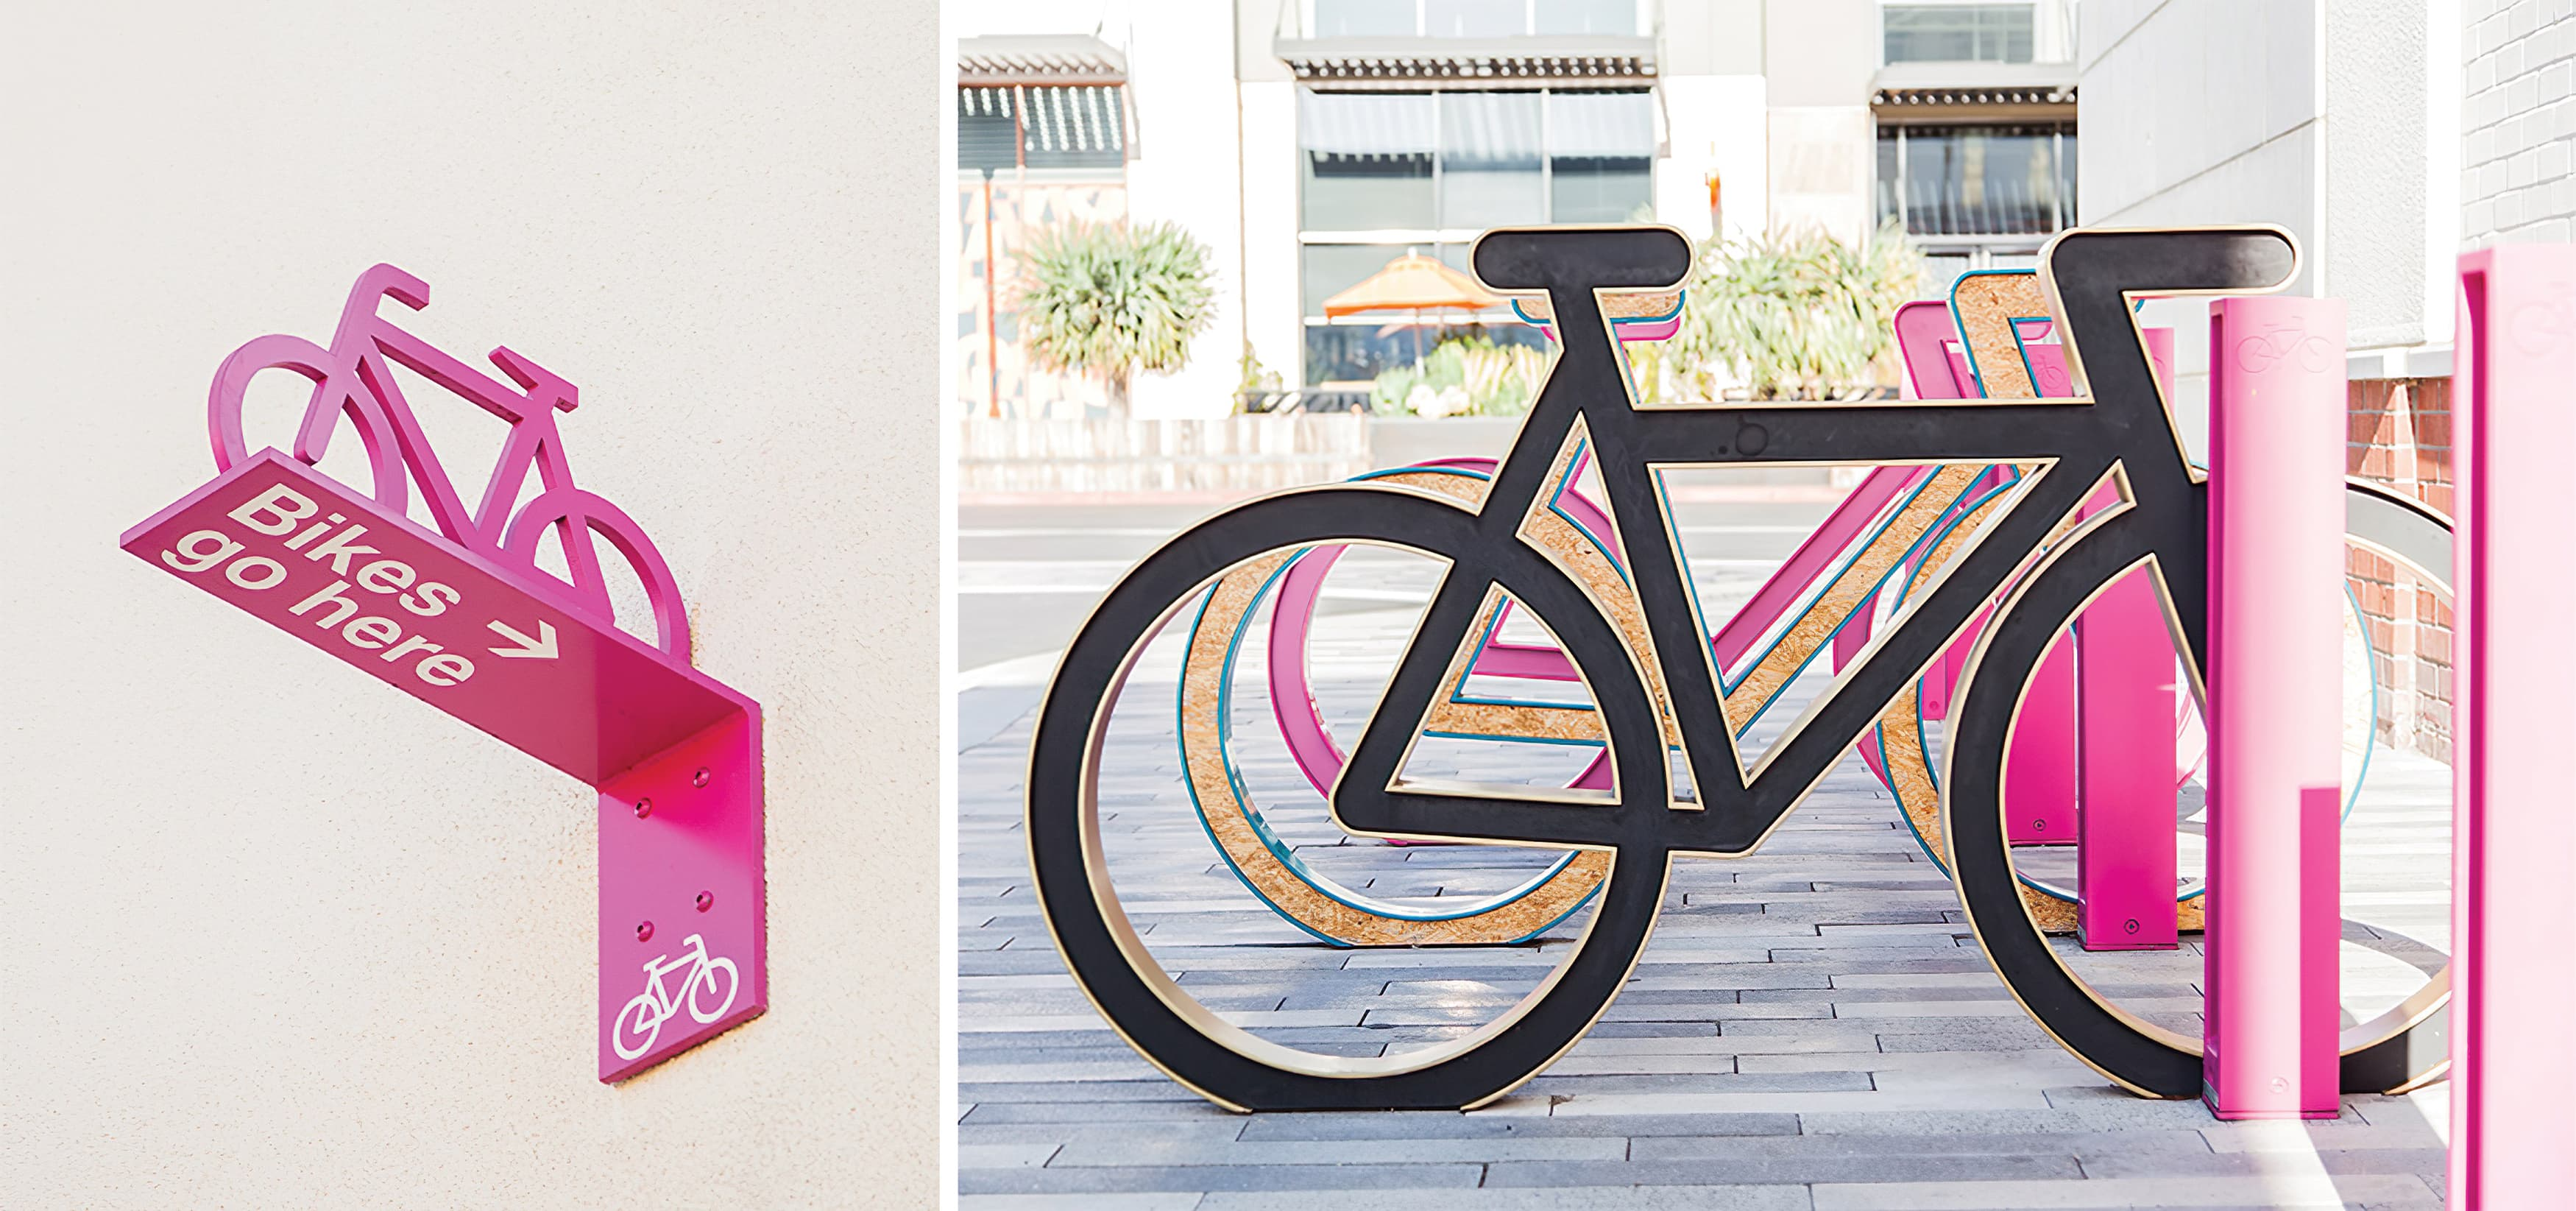 Monet Avenue shopping district bike parking amenity design